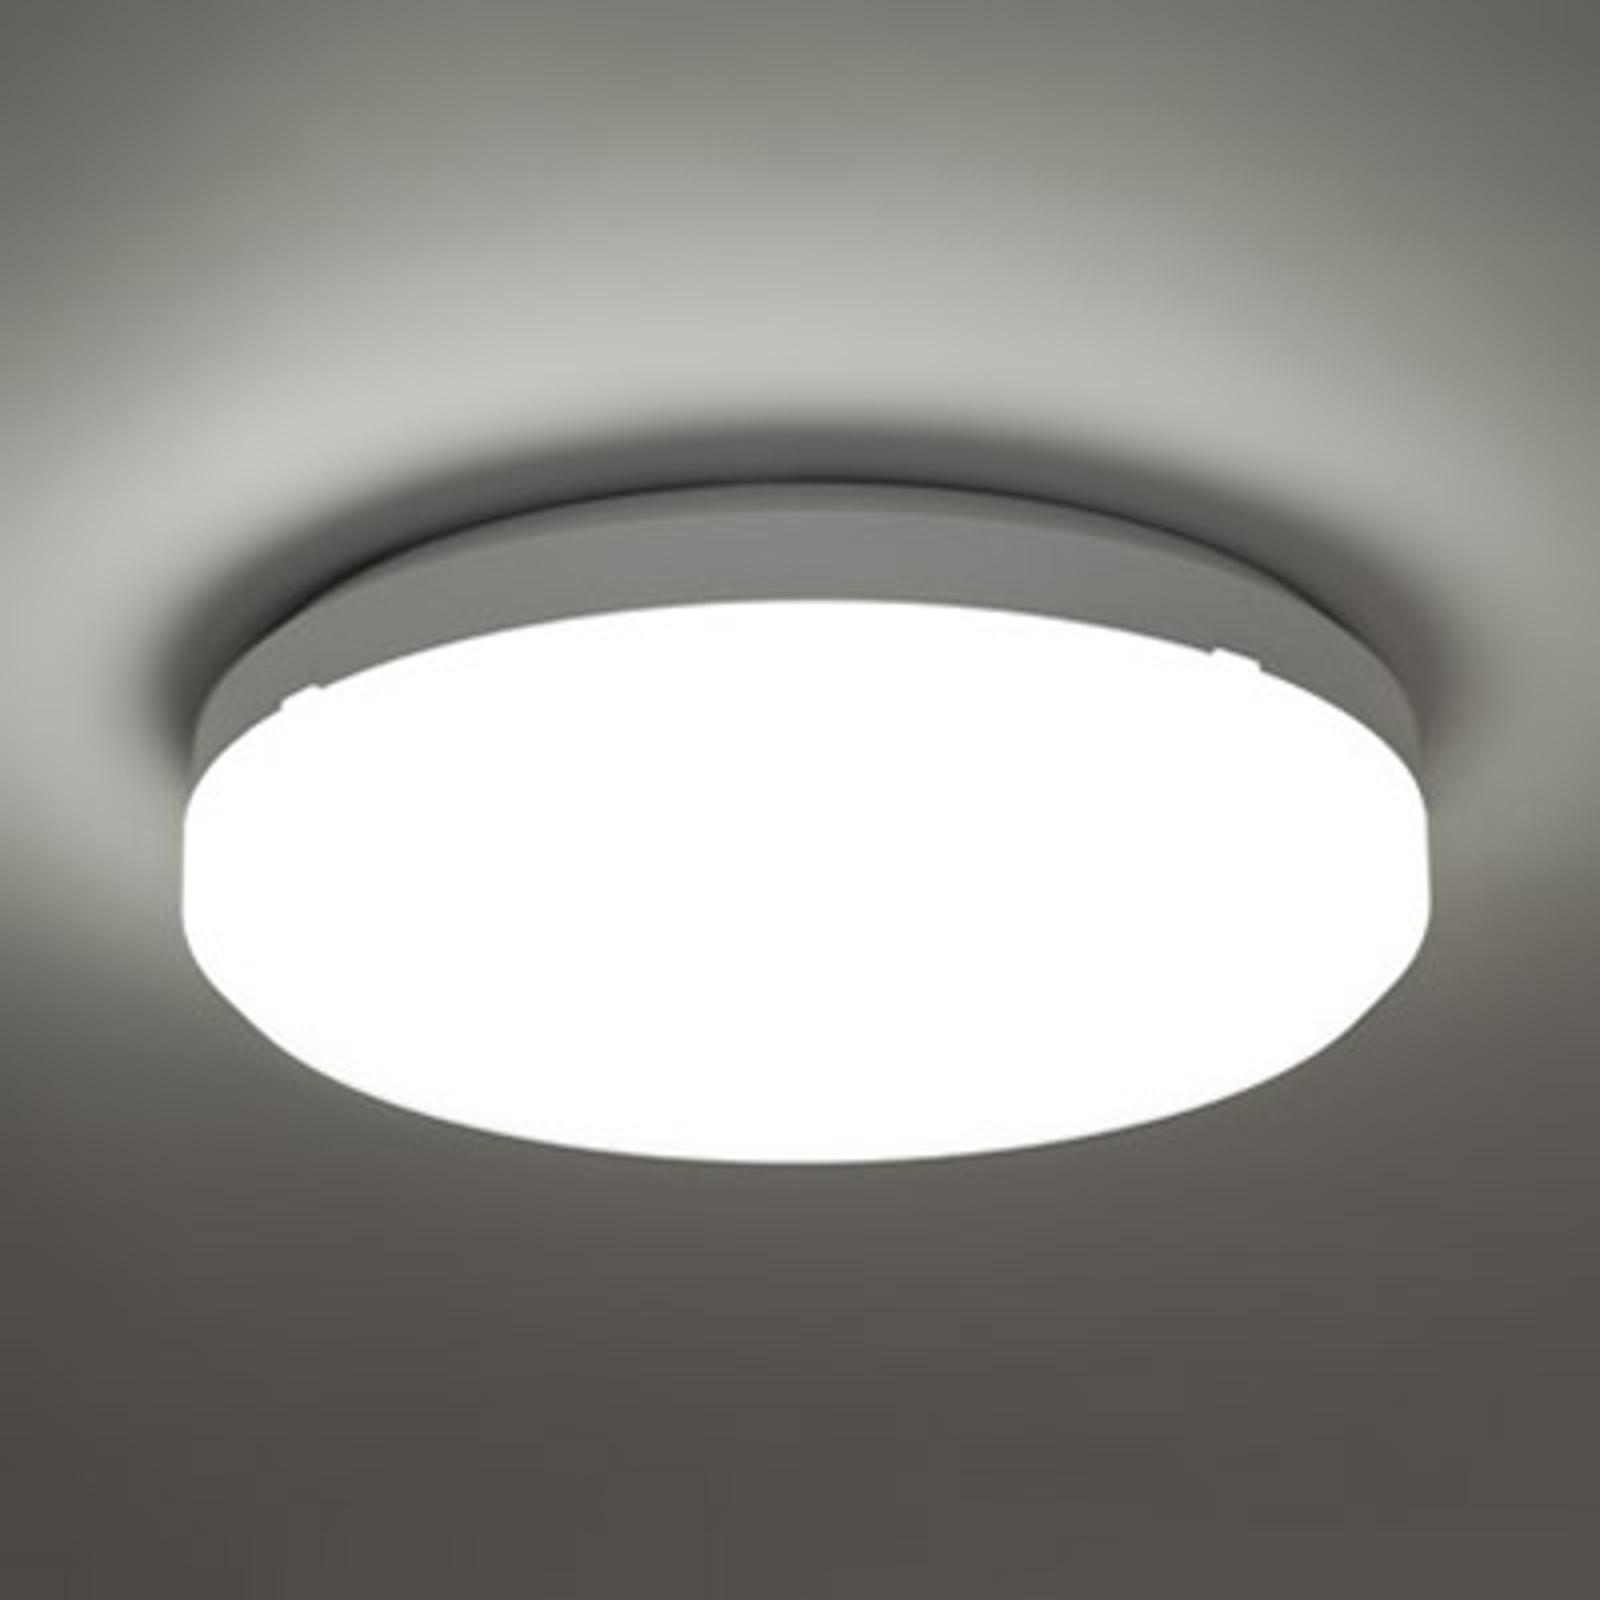 SUN 15 - led-plafondlamp IP65, 26W, 4000 K, uw